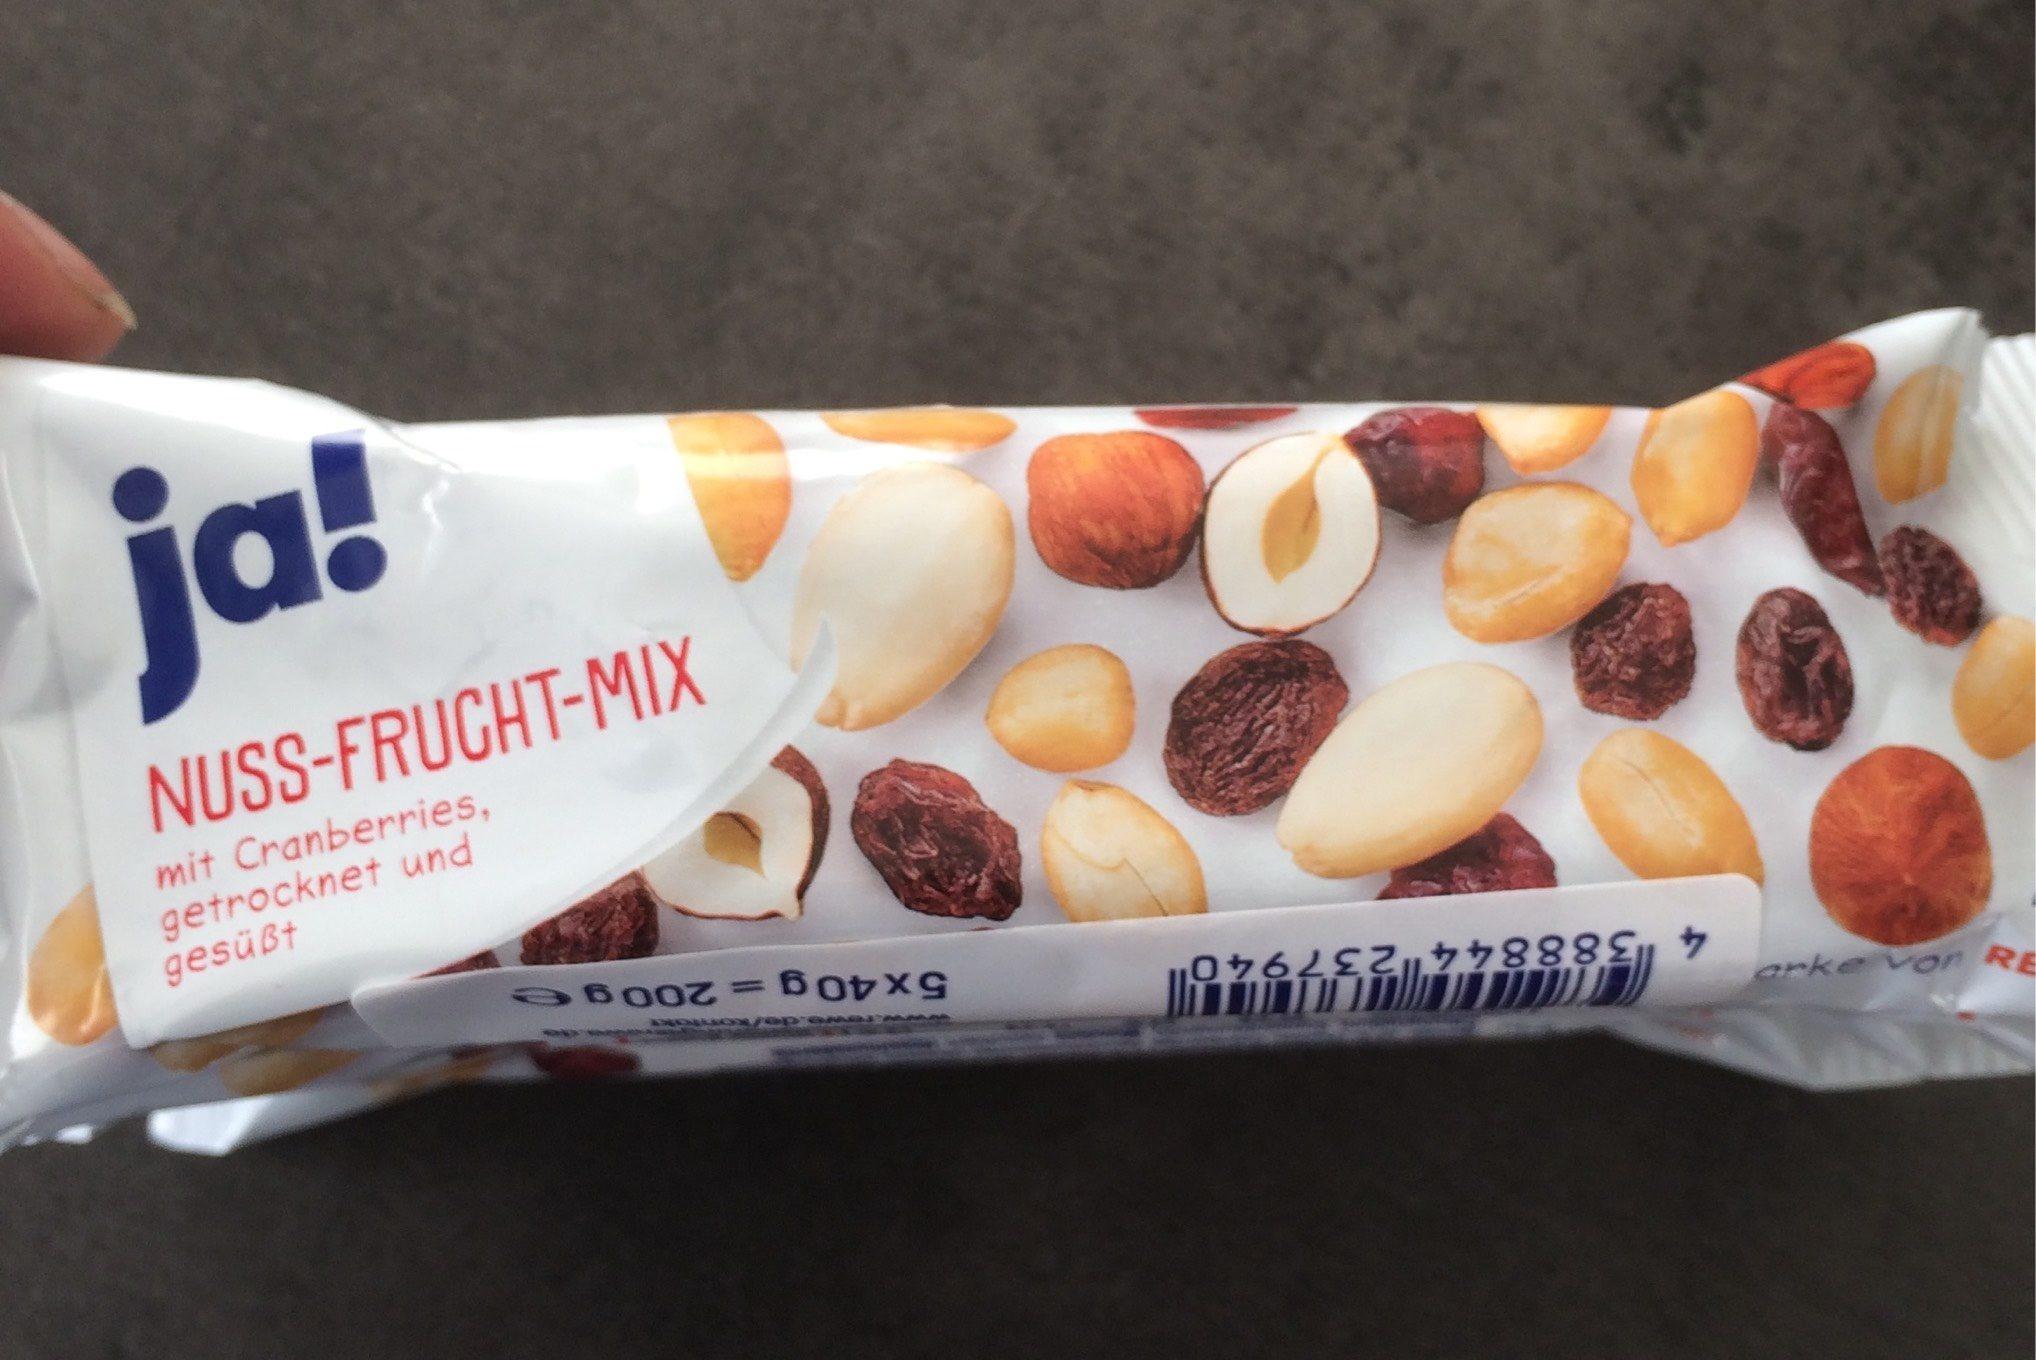 Nuss frucht mix - Product - de